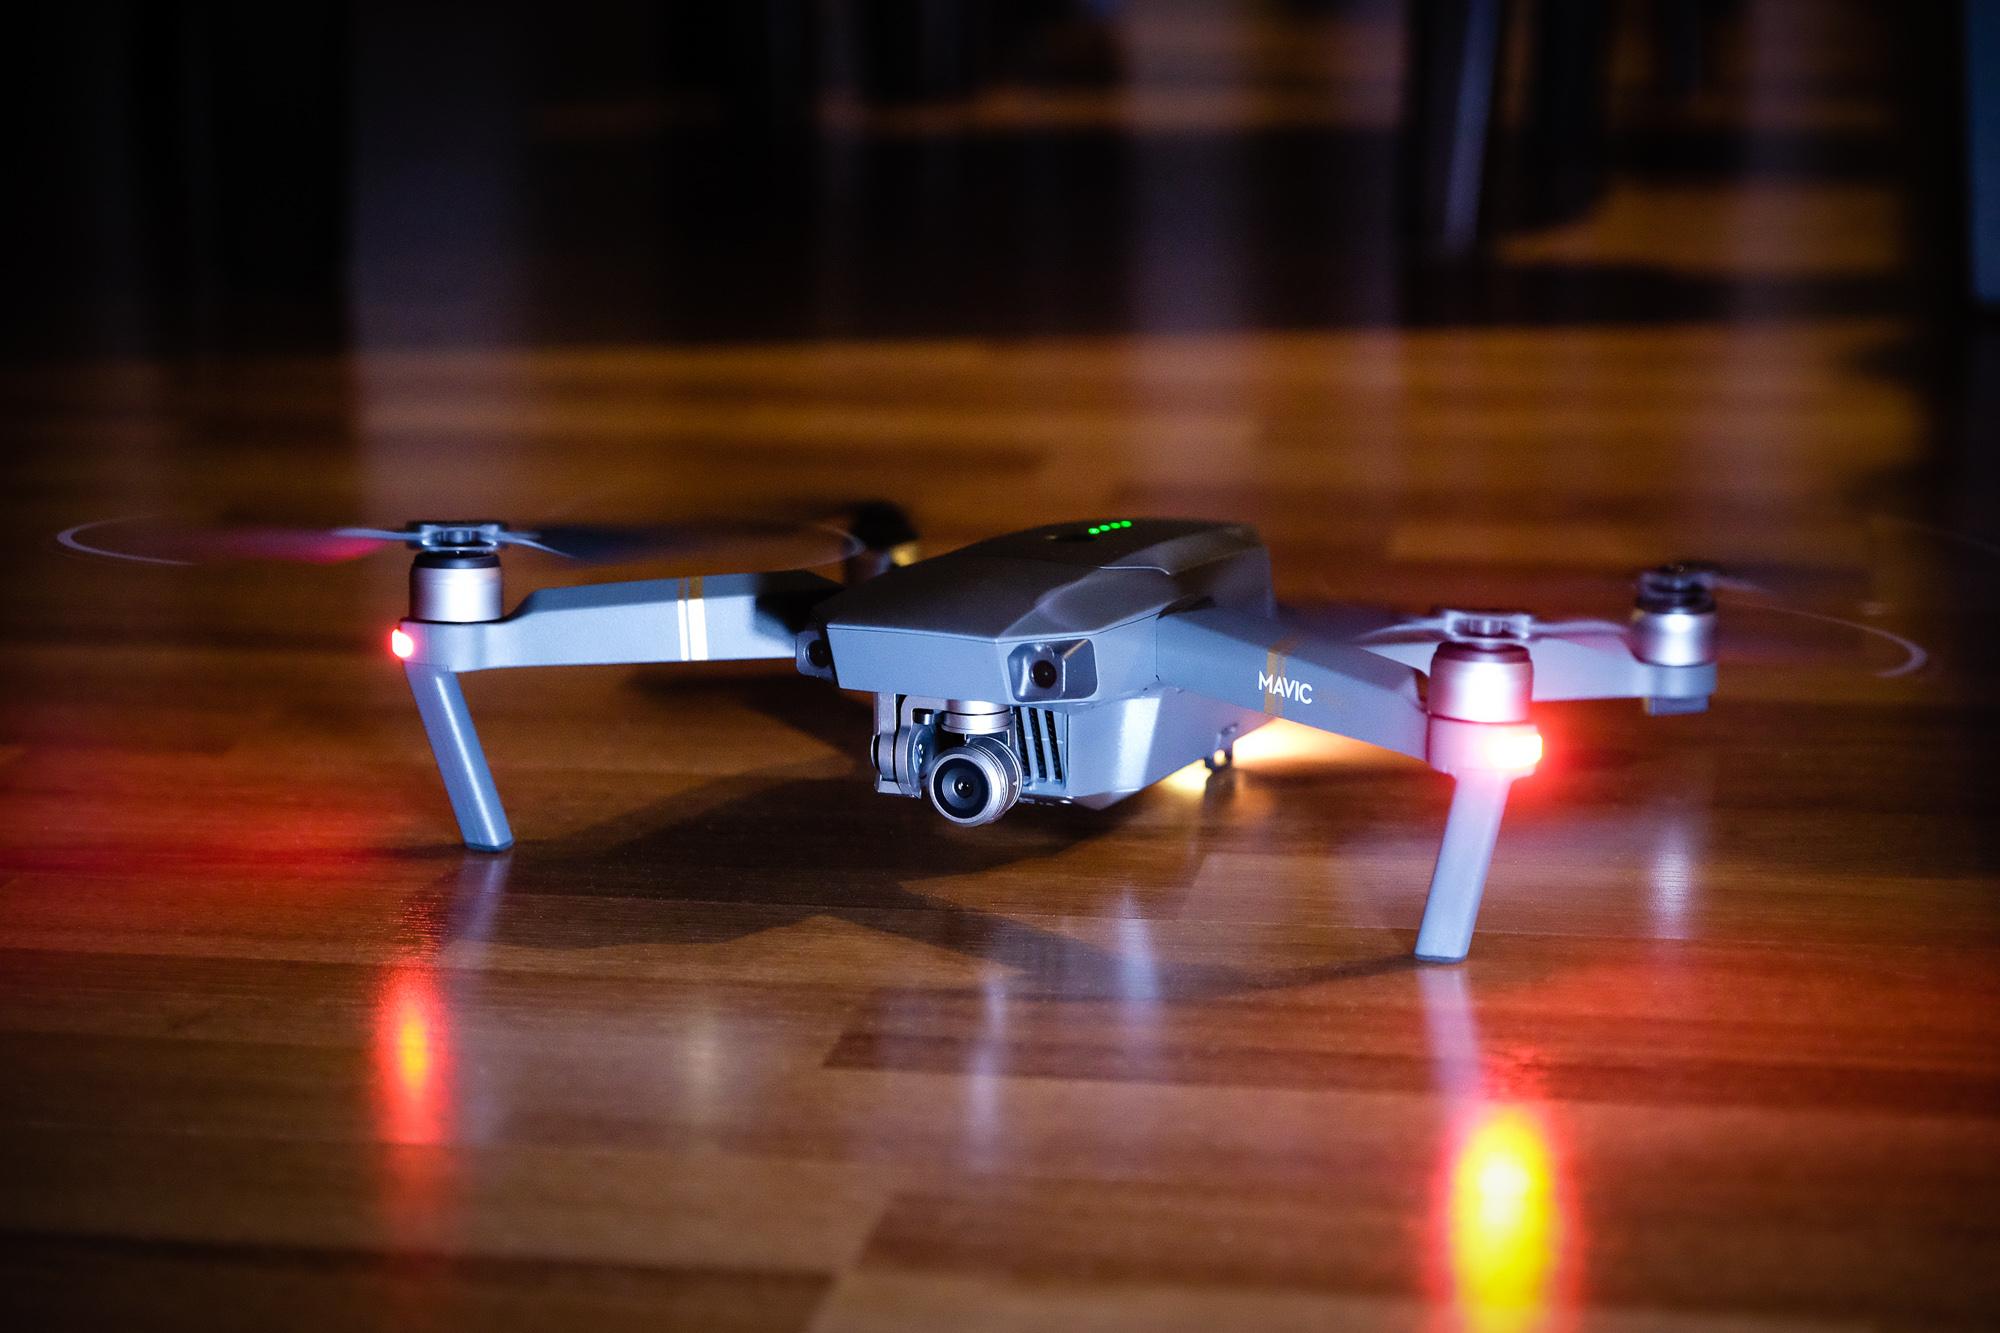 18 Dji Mavic Air 2 Price In Bangladesh - Drone Fest